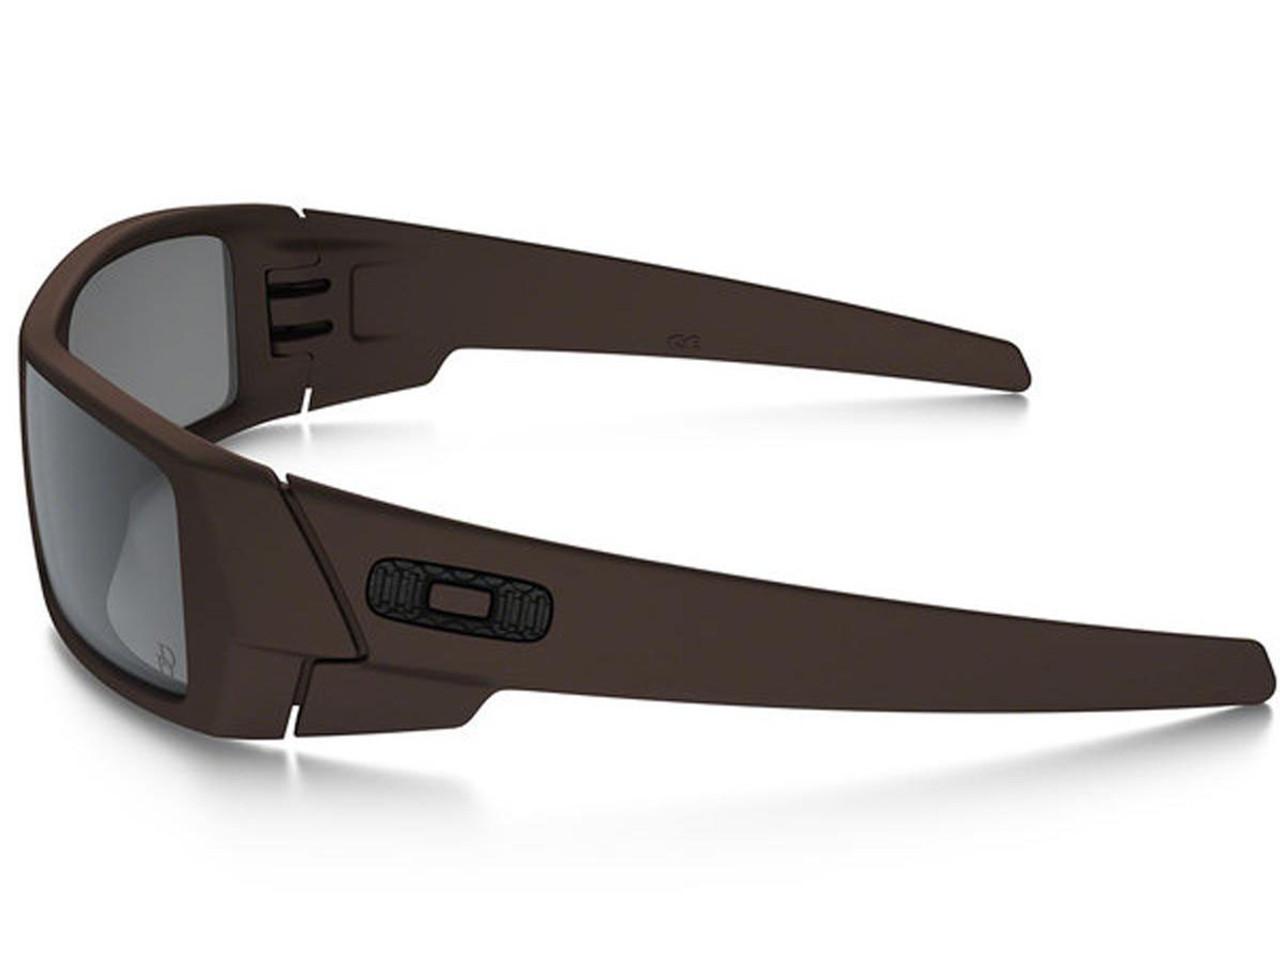 355382b8be Oakley Gascan Sunglasses (Color  Cerakote Desert   Black Iridium   Daniel  Defense) - Hero Outdoors